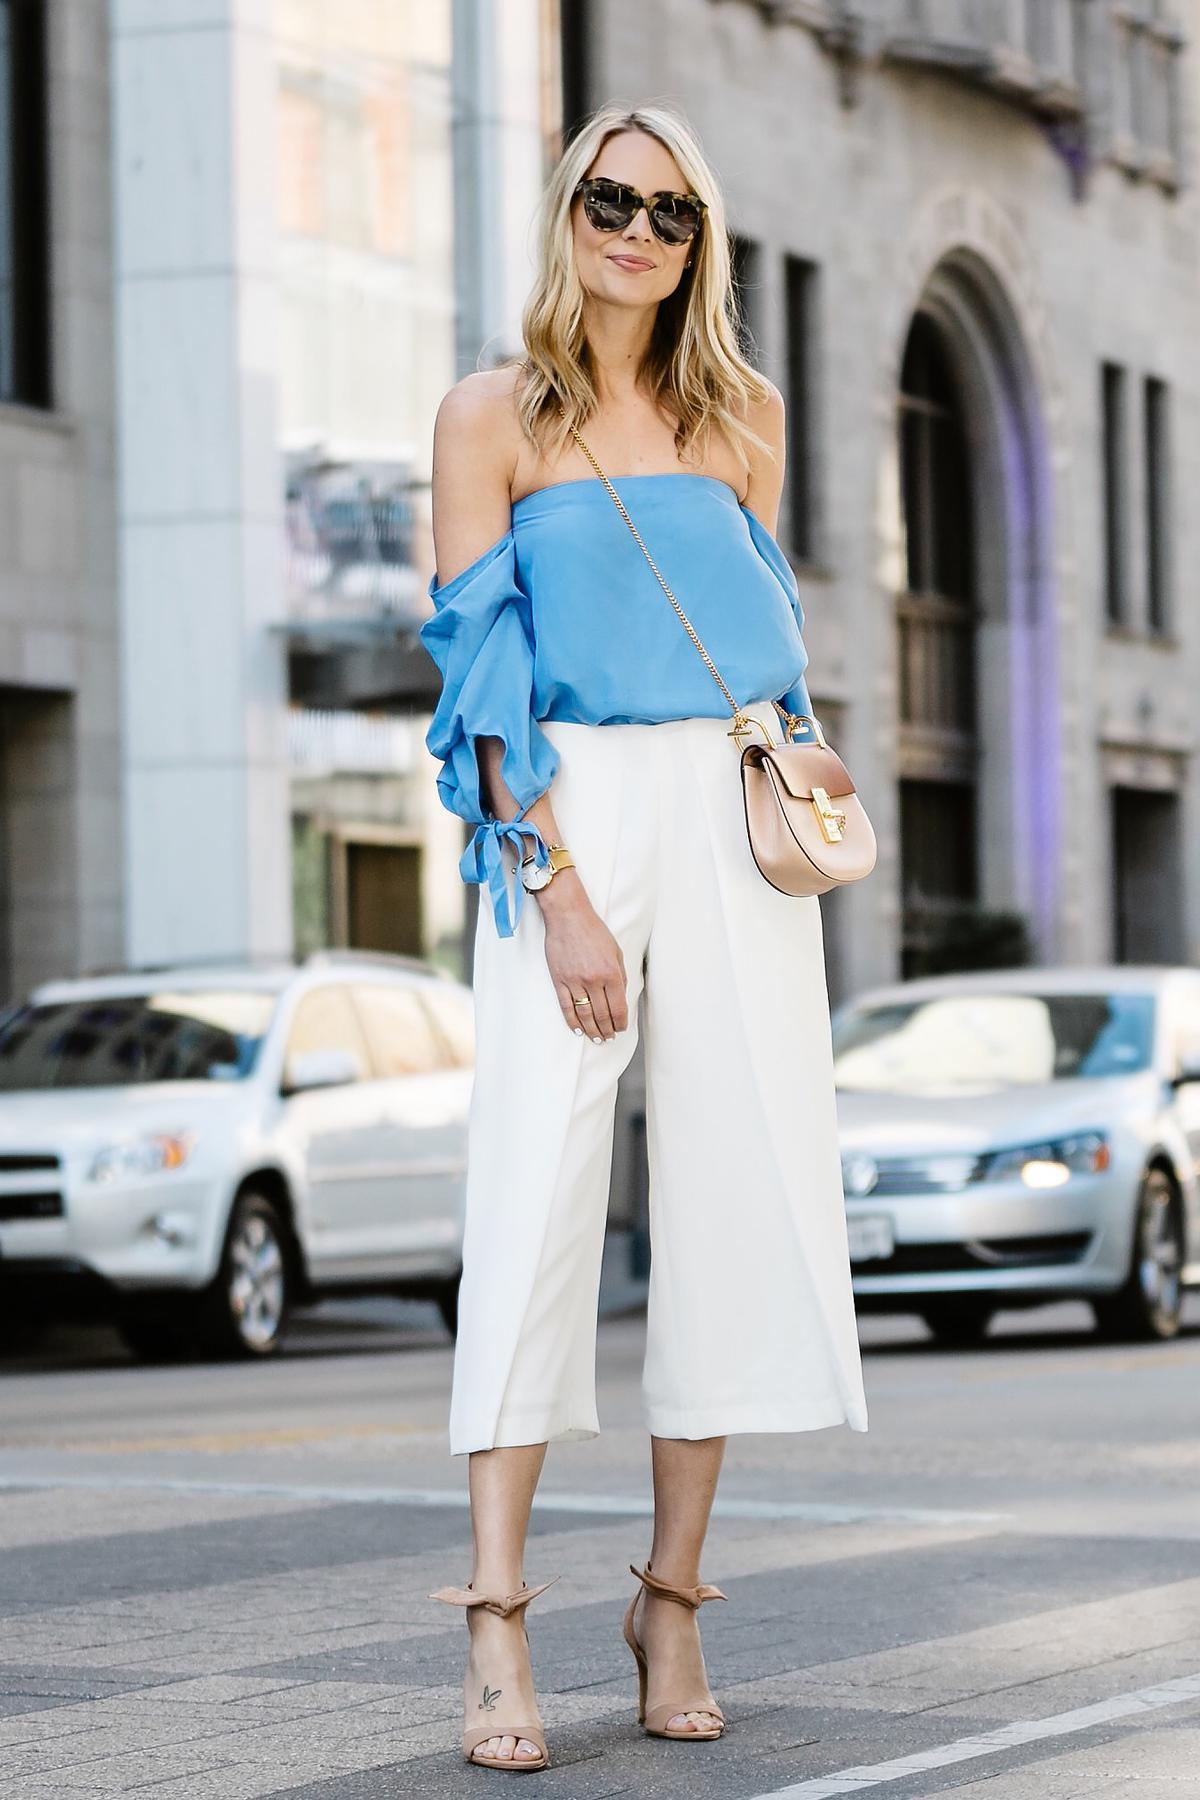 Fashion Jackson, Dallas Blogger, Fashion Blogger, Street Style, Club Monaco Liki Top, Blue Off-the-Shoulder Top, White Culottes, Chloe Drew Handbag, Tan Ankle Strap Bow Heeled Sandals